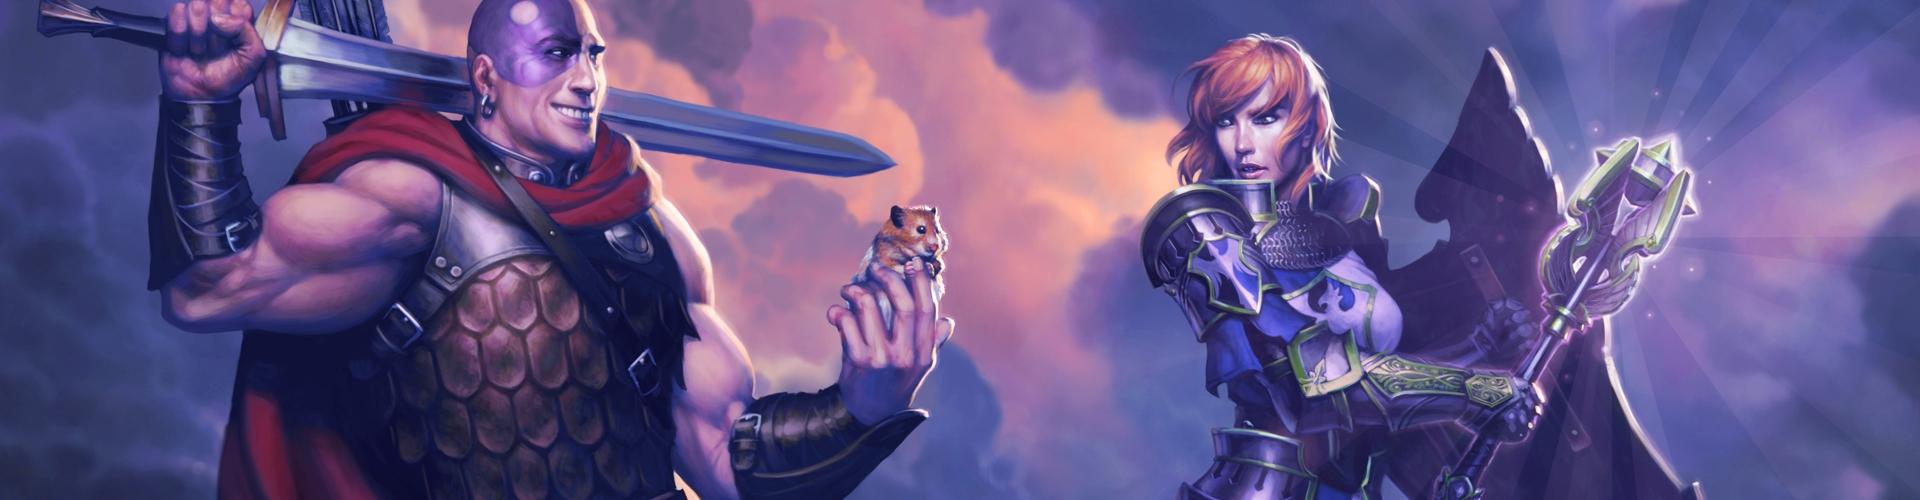 Neverwinter Elemental Evil Dungeons Amp Dragons